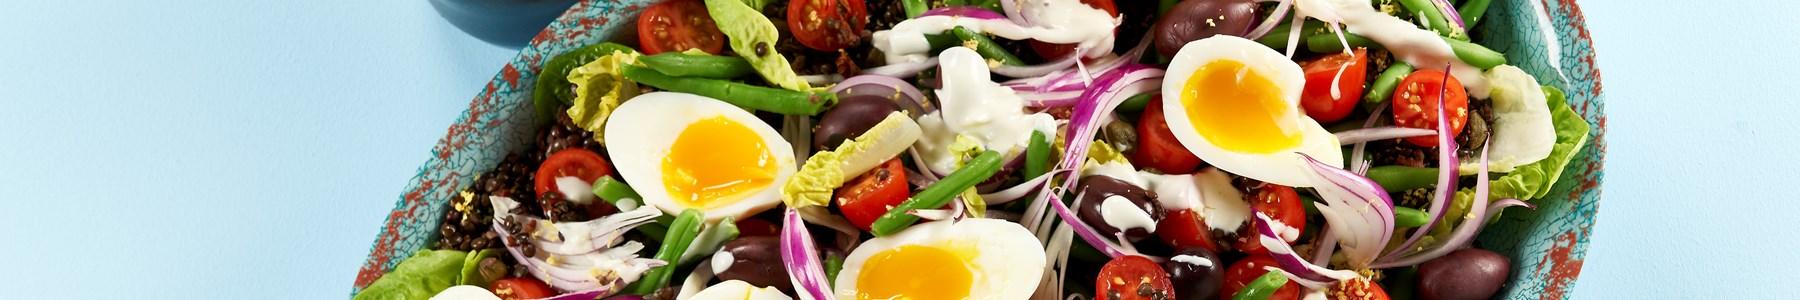 Hurtig + Salater + Hvidløg + Efterår